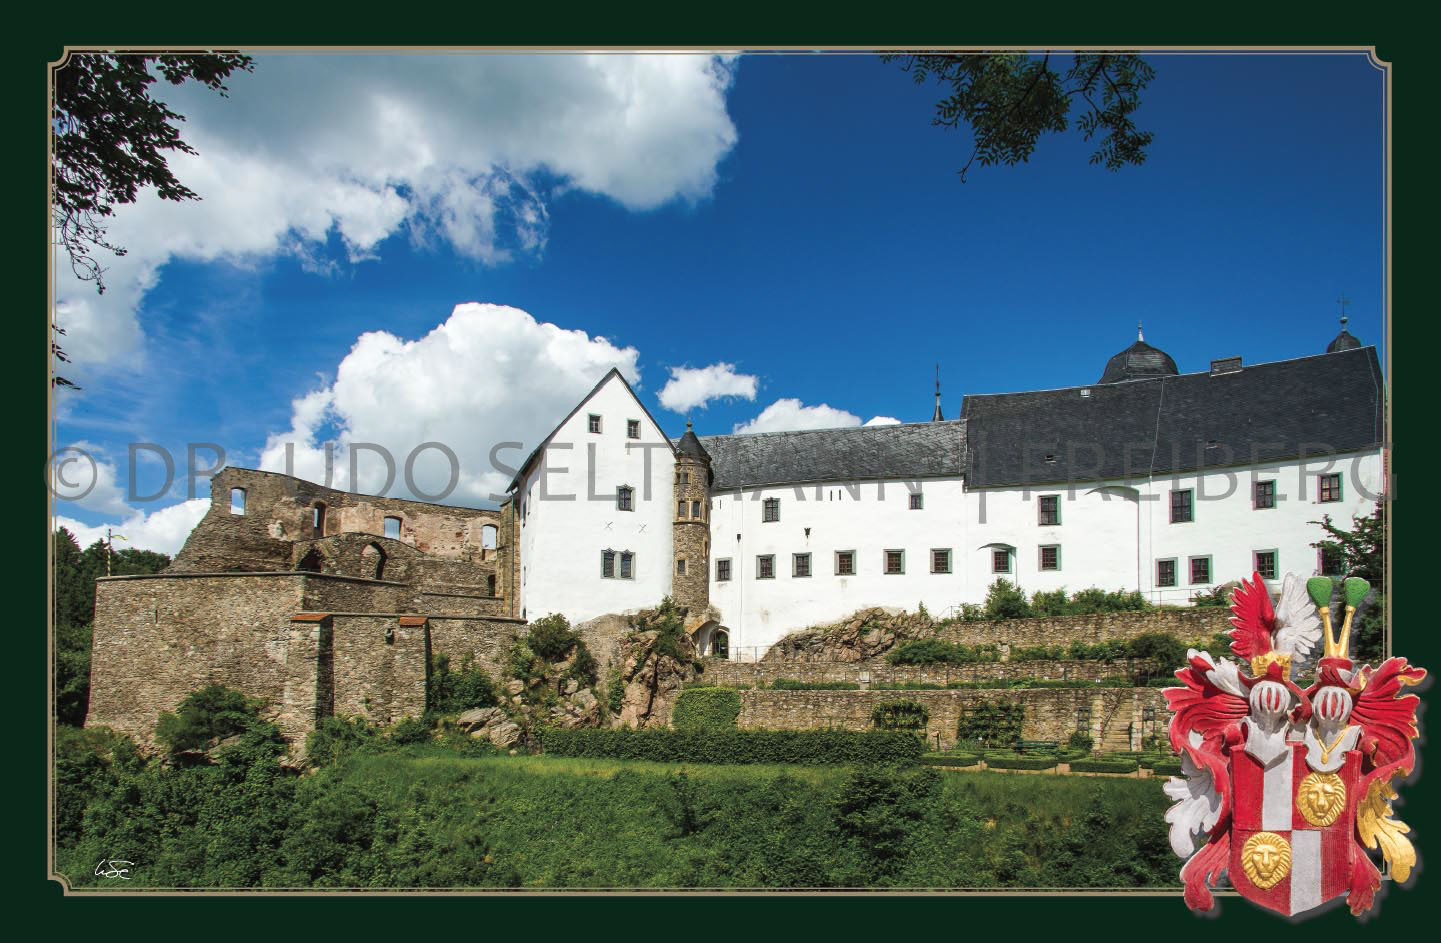 GK 801 Osterzgebirgsmuseum Schloss Lauenstein (Osterzgebirge)